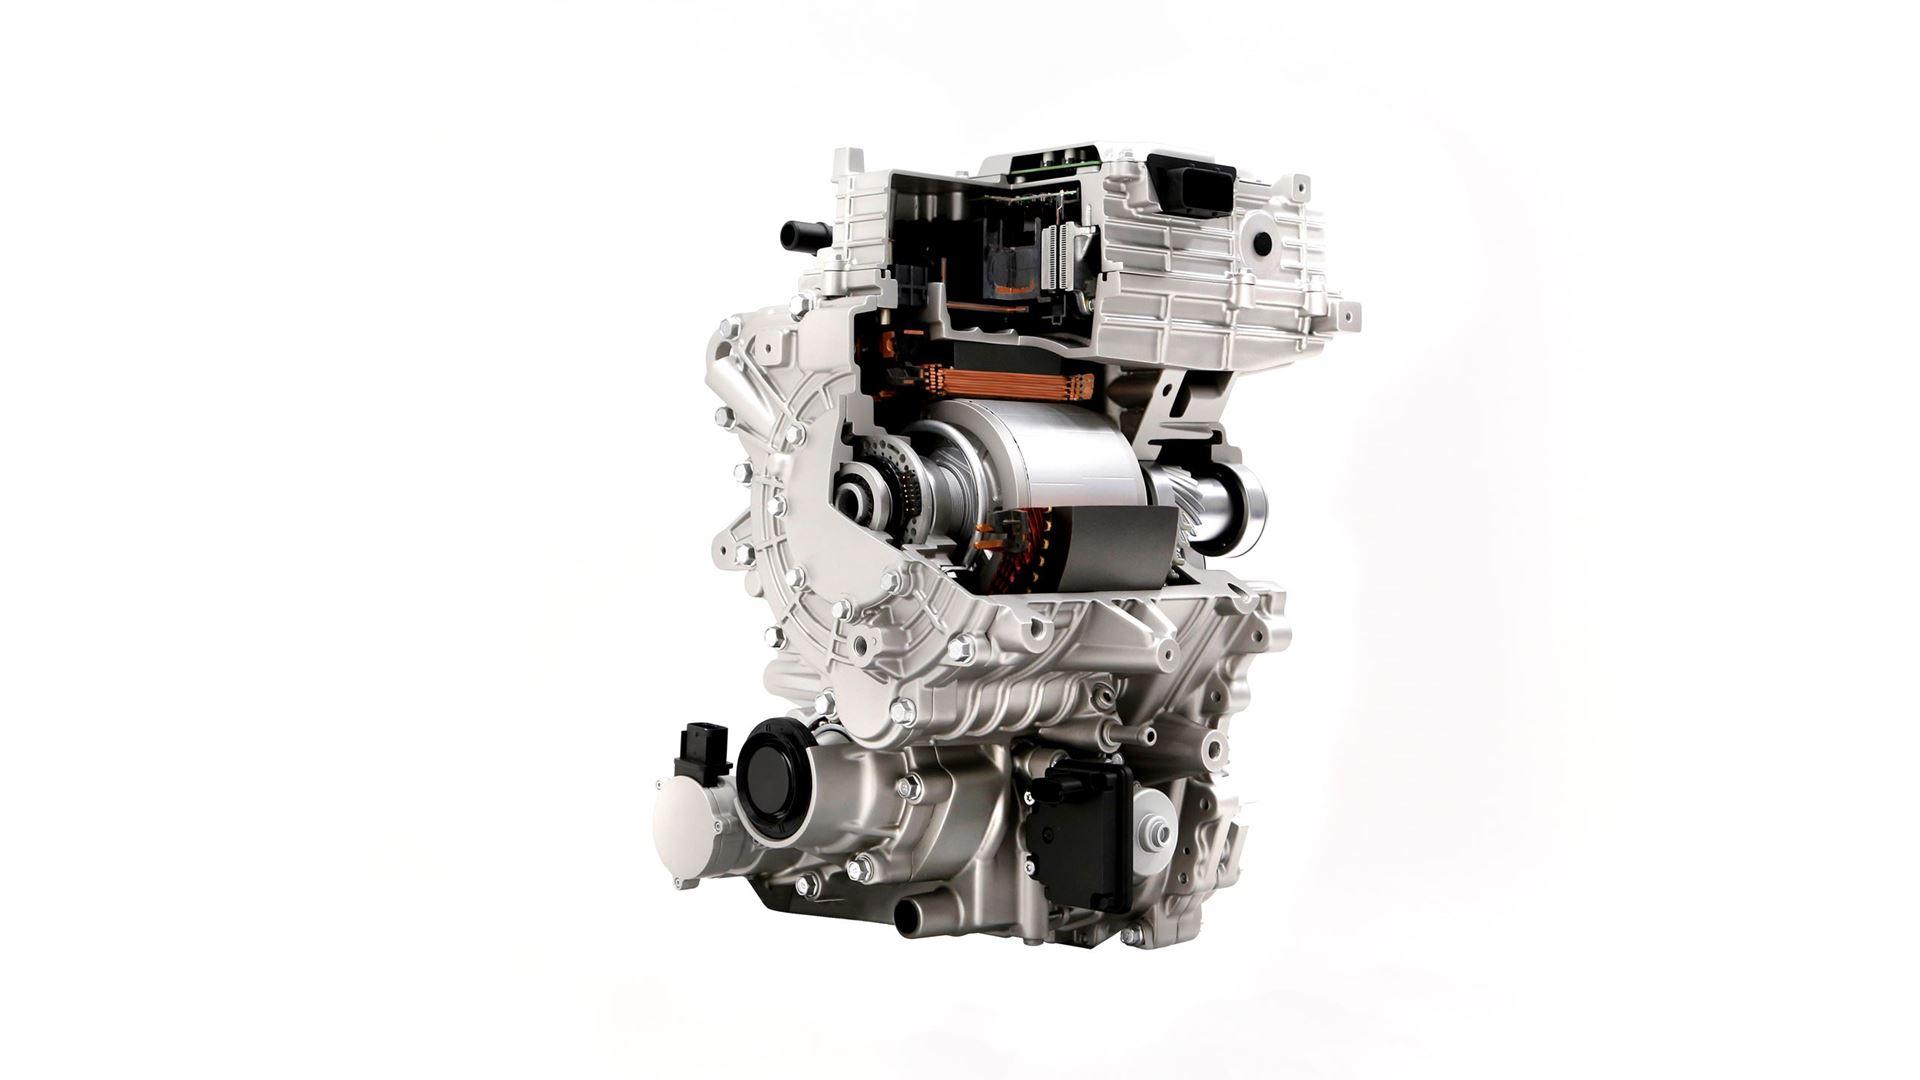 Hyundai Motor Group to Lead Charge into Electric Era with Dedicated EV Platform 'E-GMP' - Image 3